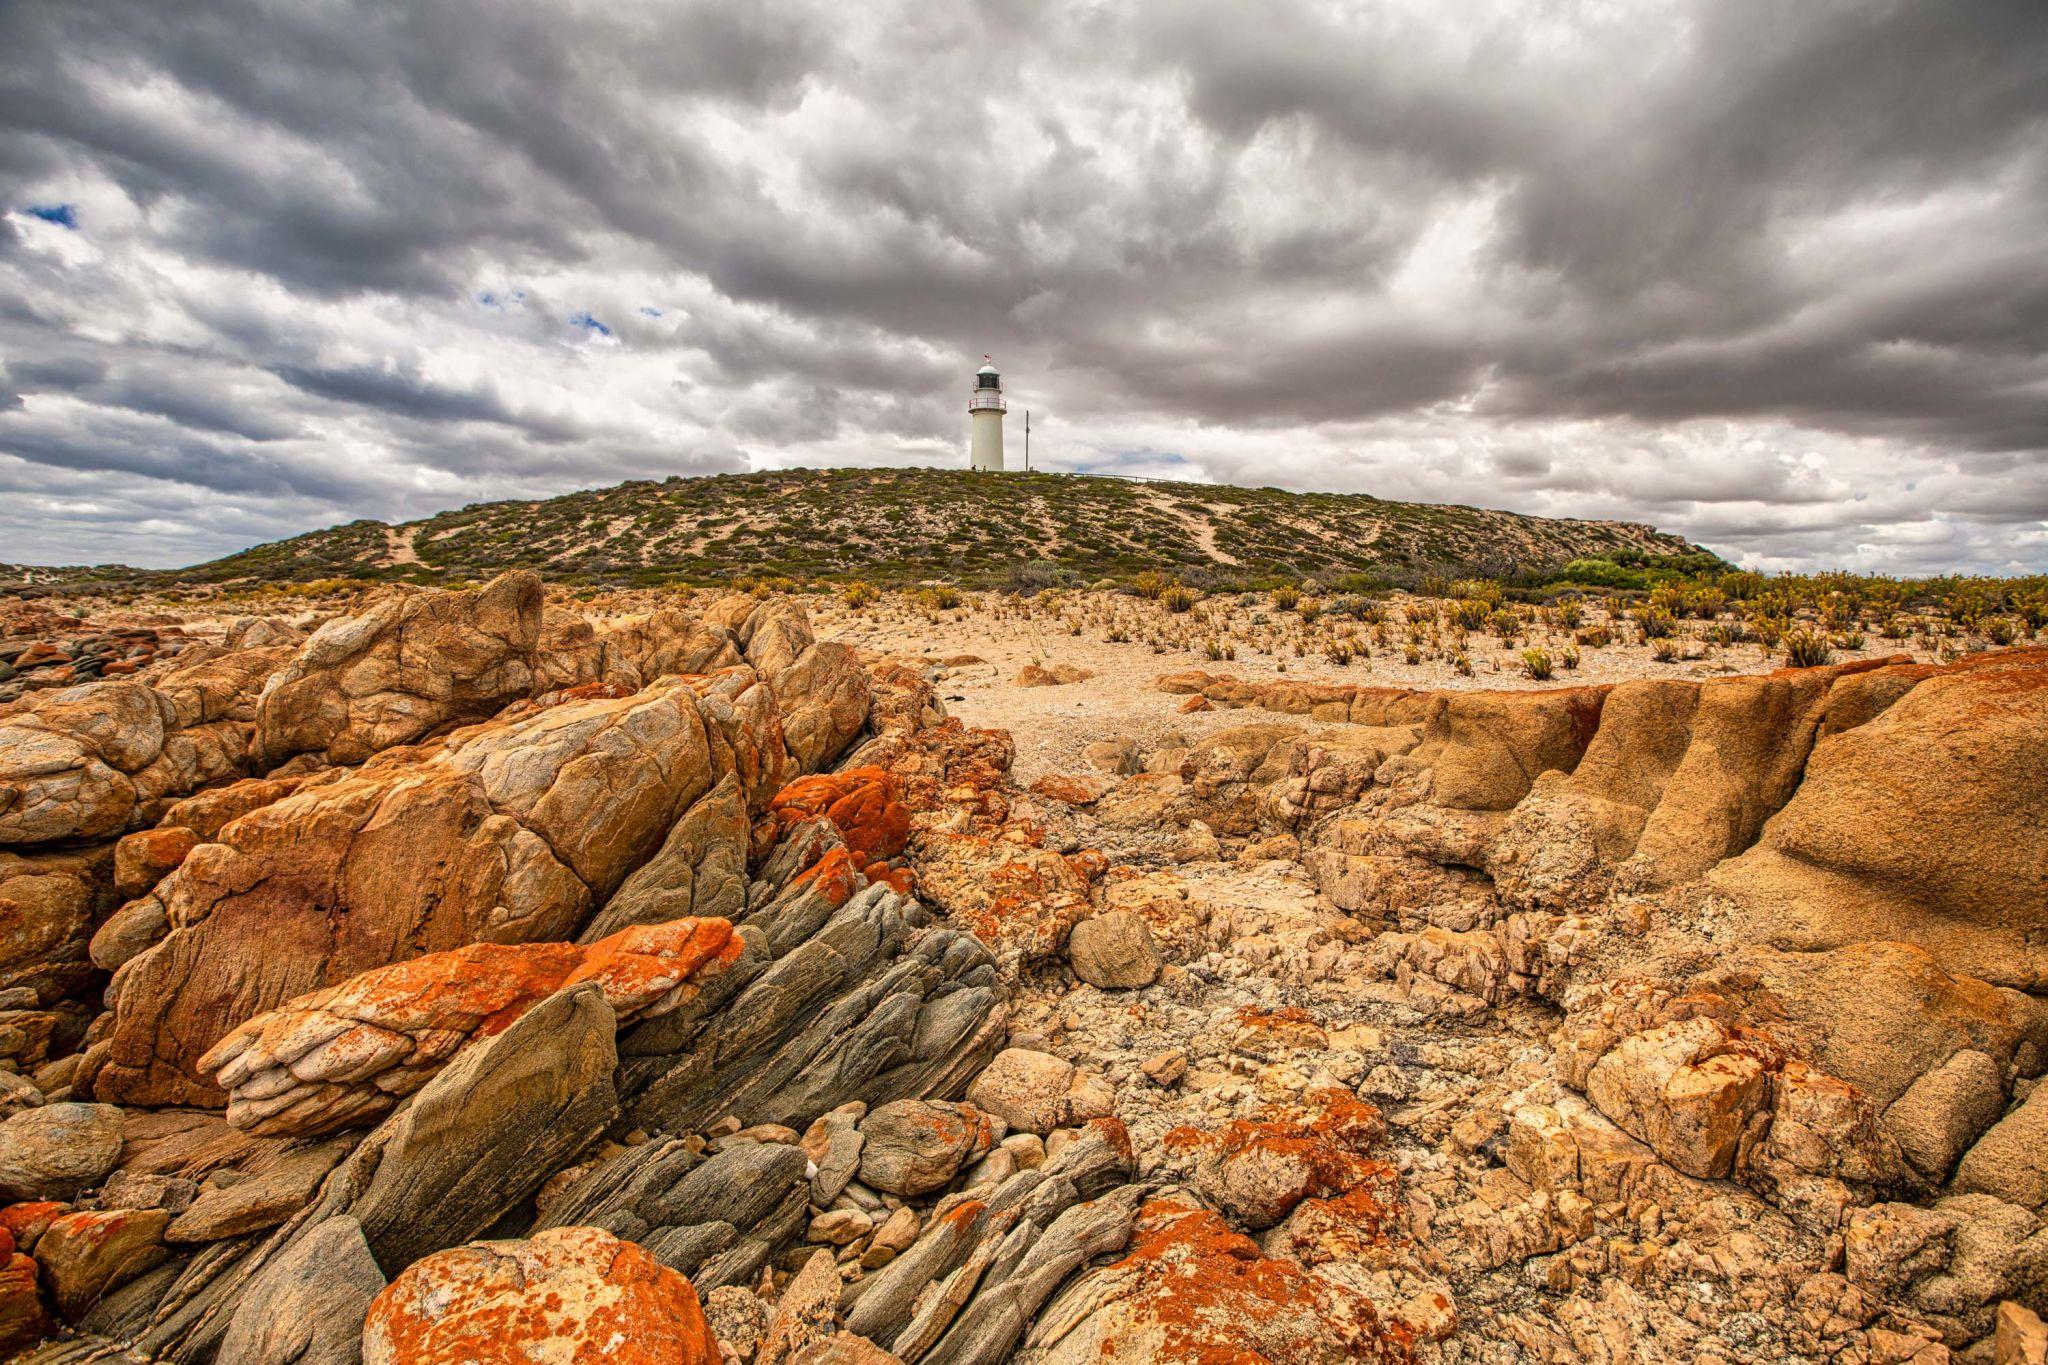 Red rocks Corny Point Lighthouse, Yorke Penisula, SA, Australia